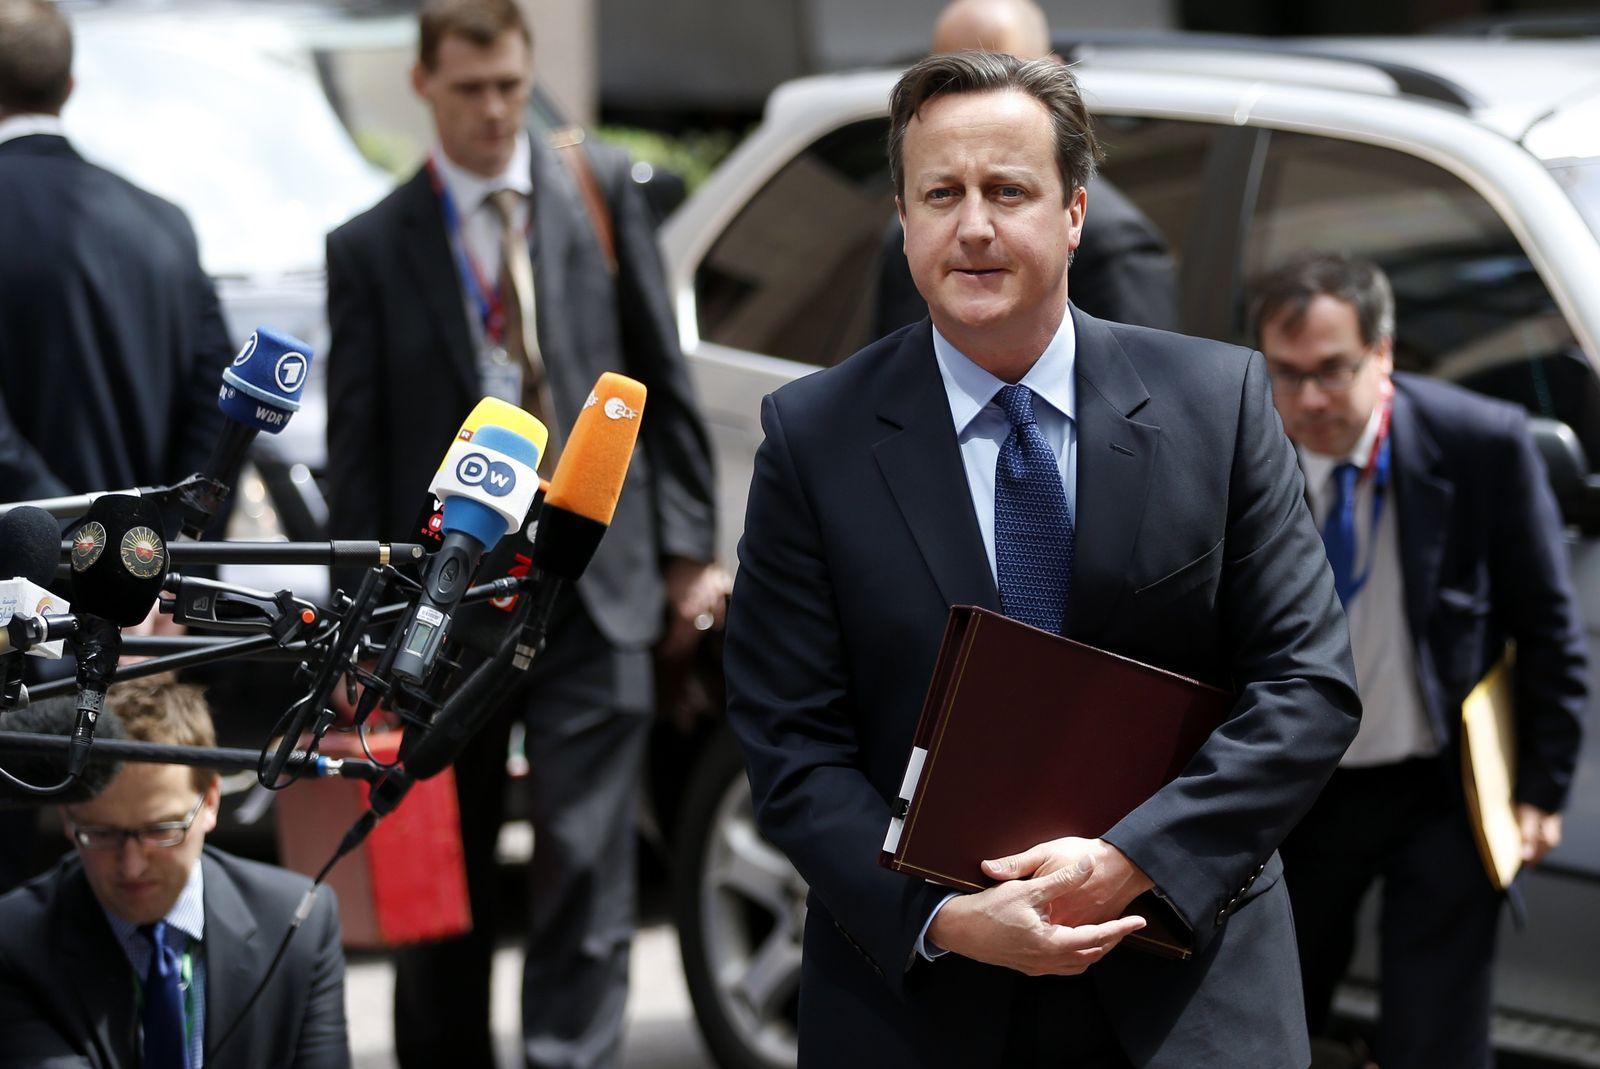 EU Summit Cameron